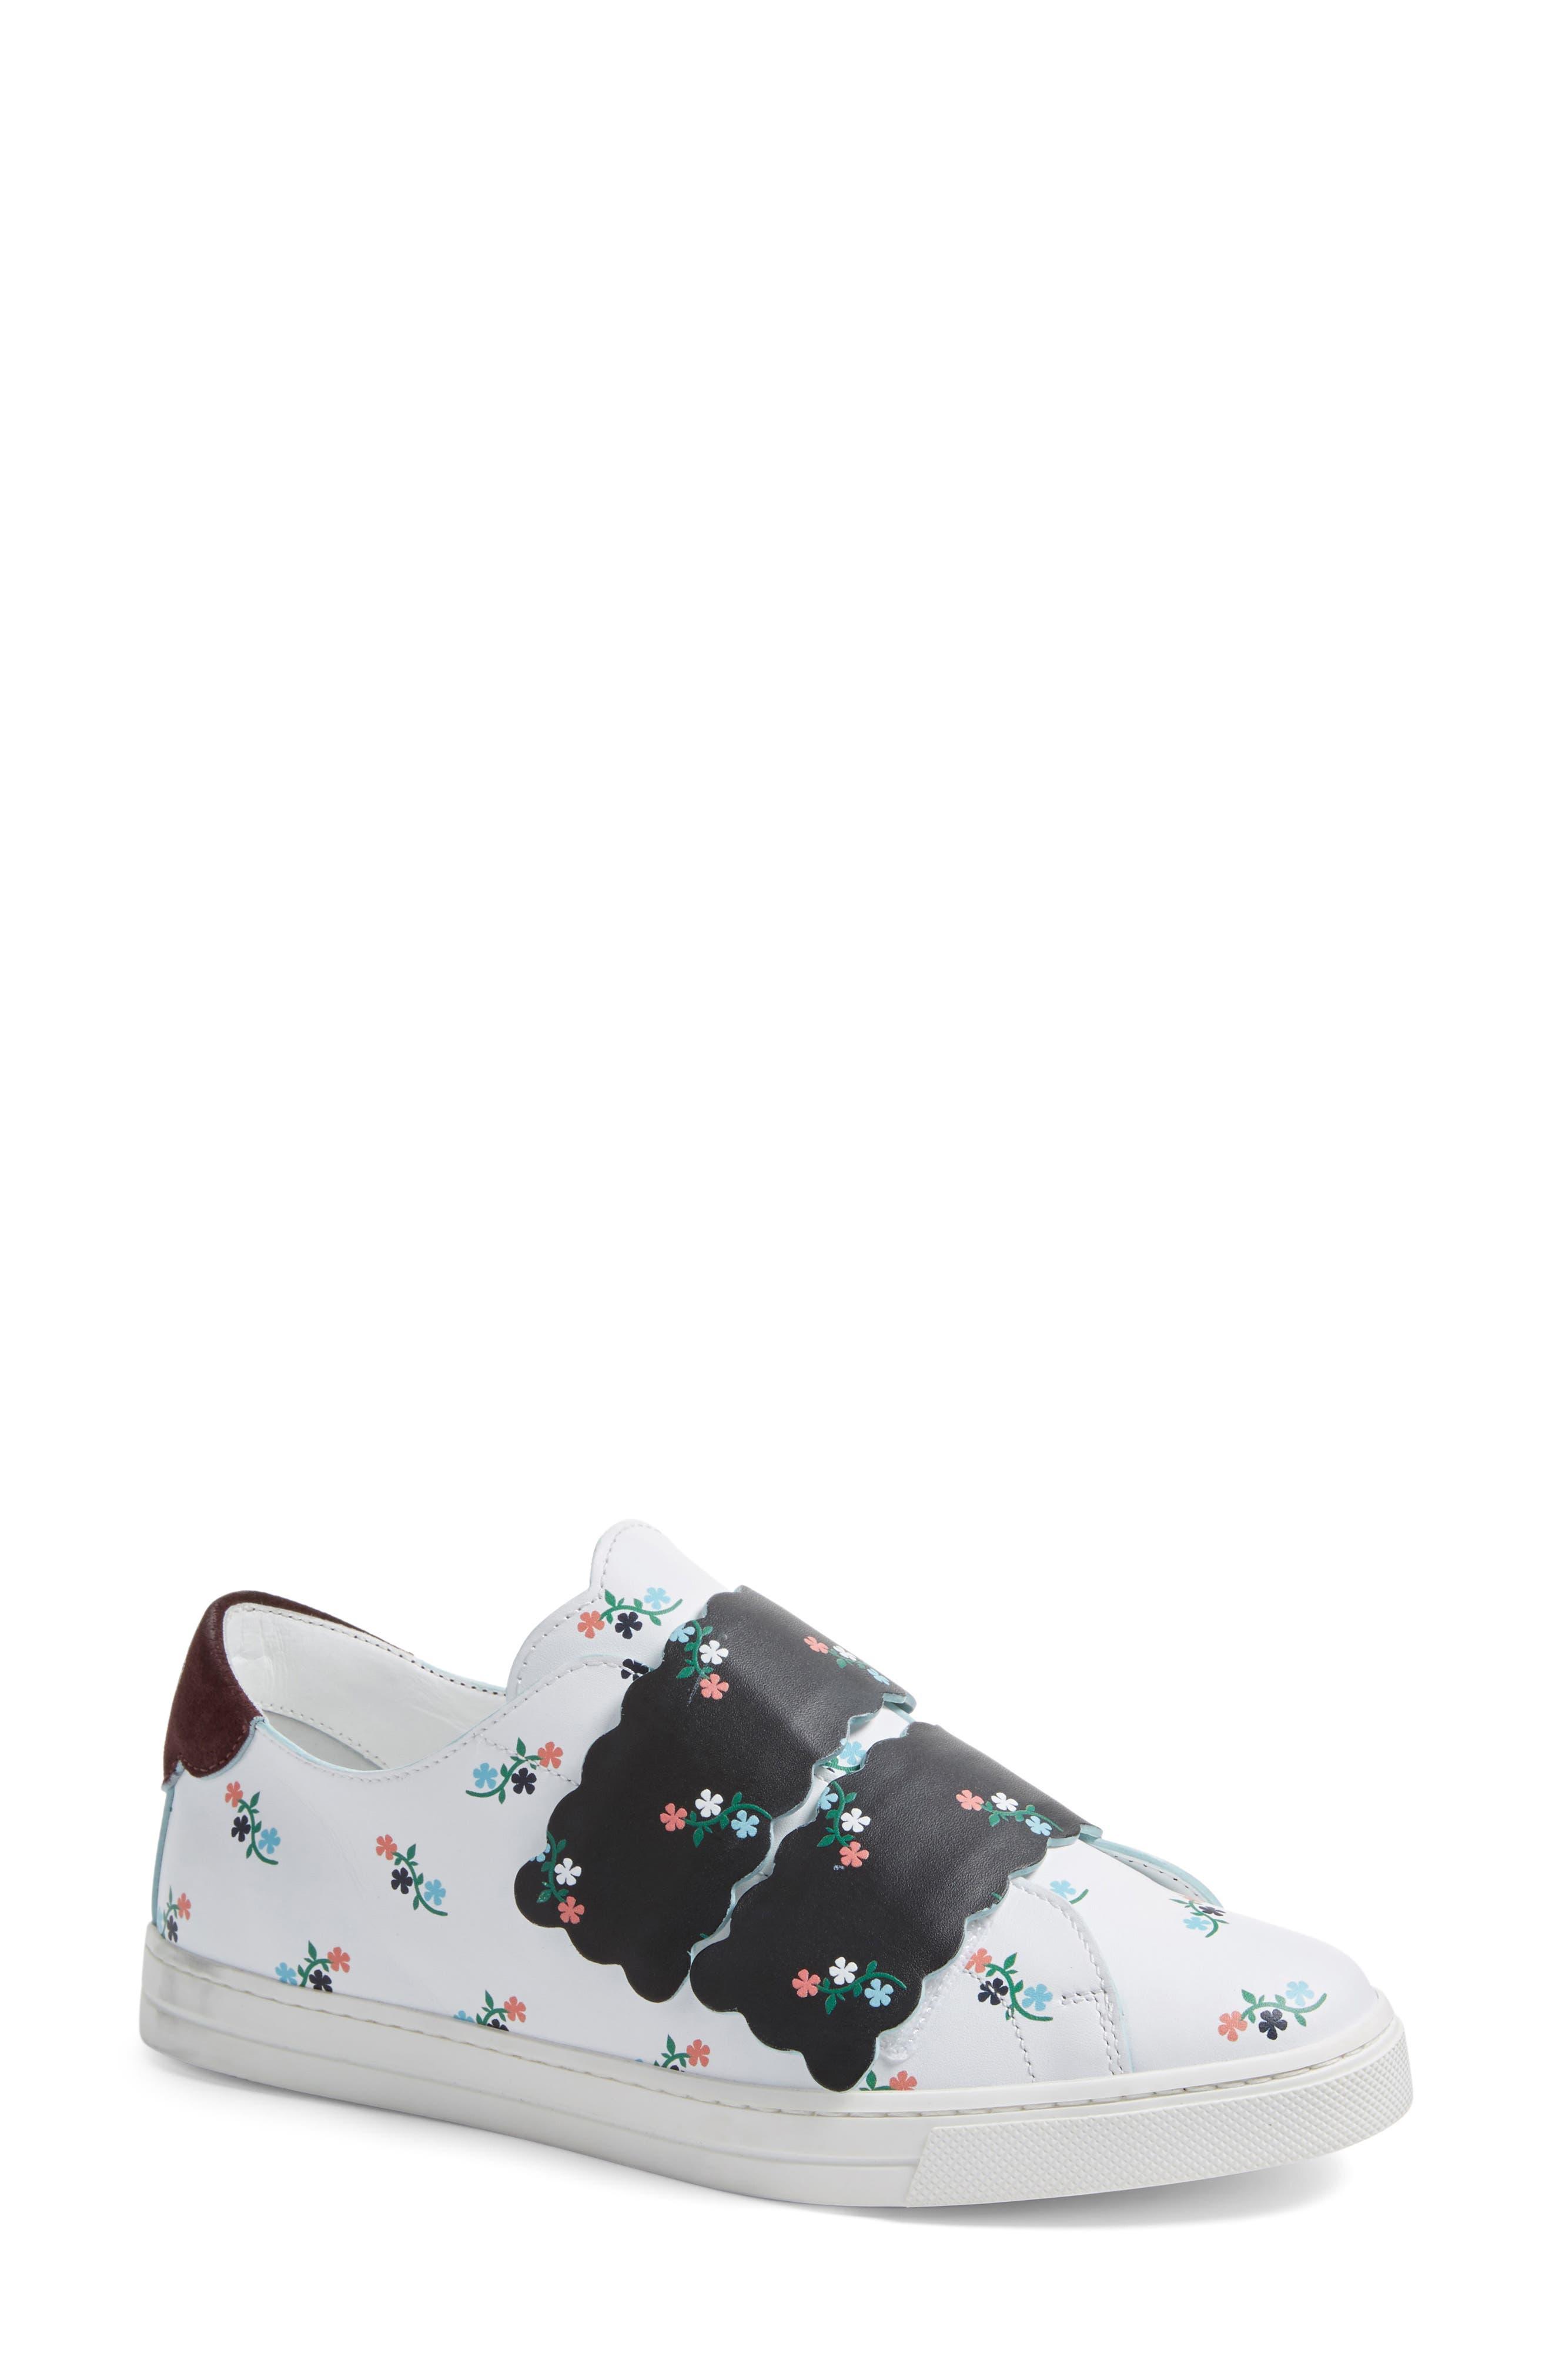 Alternate Image 1 Selected - Fendi Scallop Sneaker (Women)